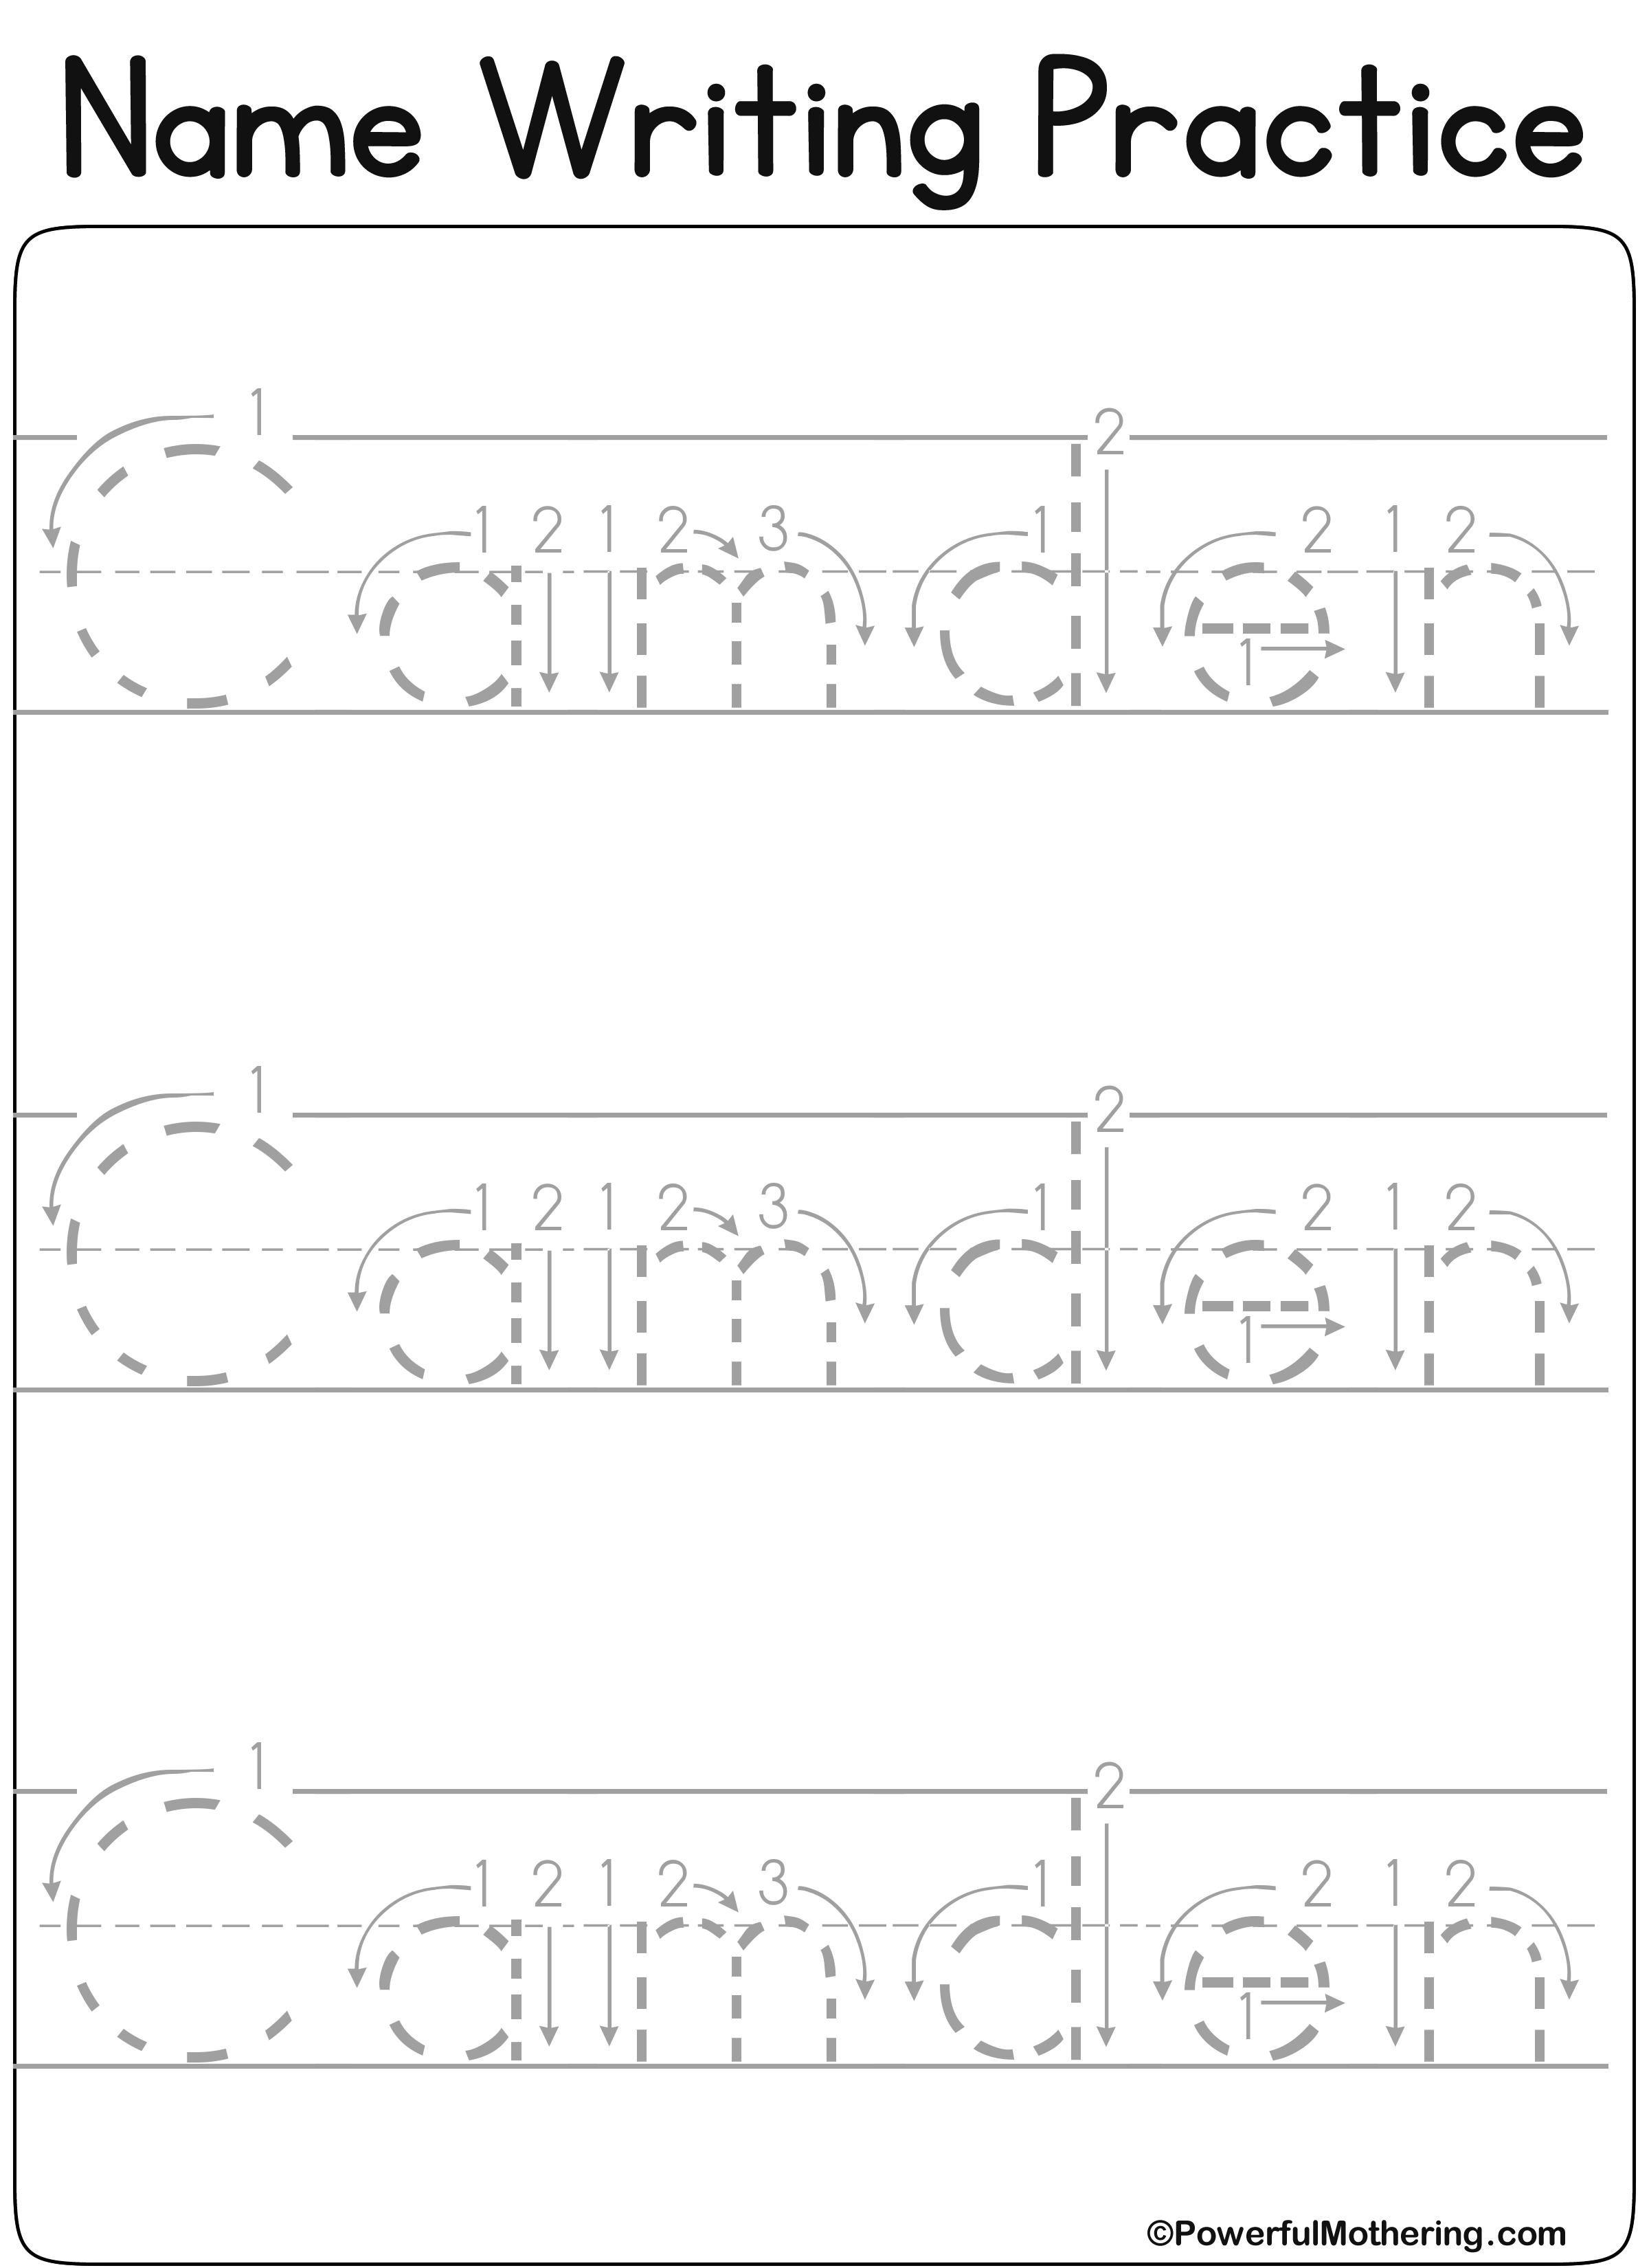 www.createprintables.com custom_name_get.php?text=Camden&font=12 ...